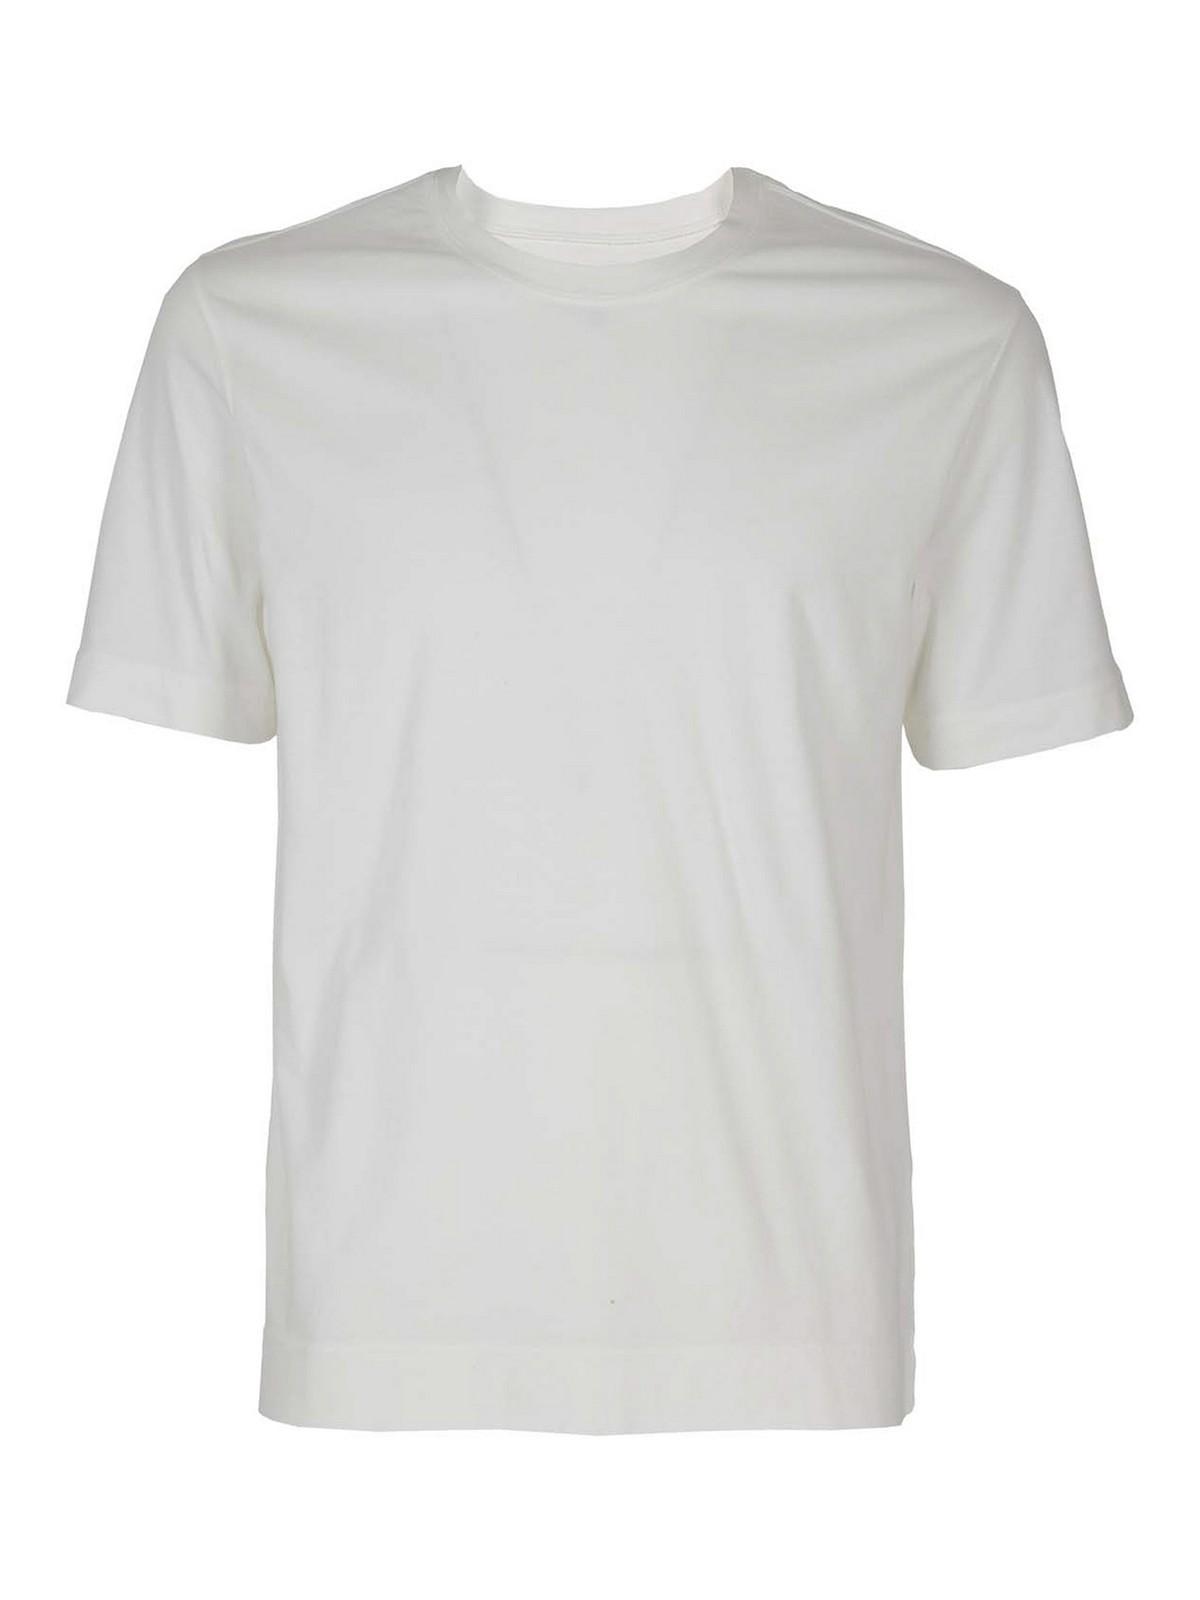 Circolo 1901 WHITE T-SHIRT